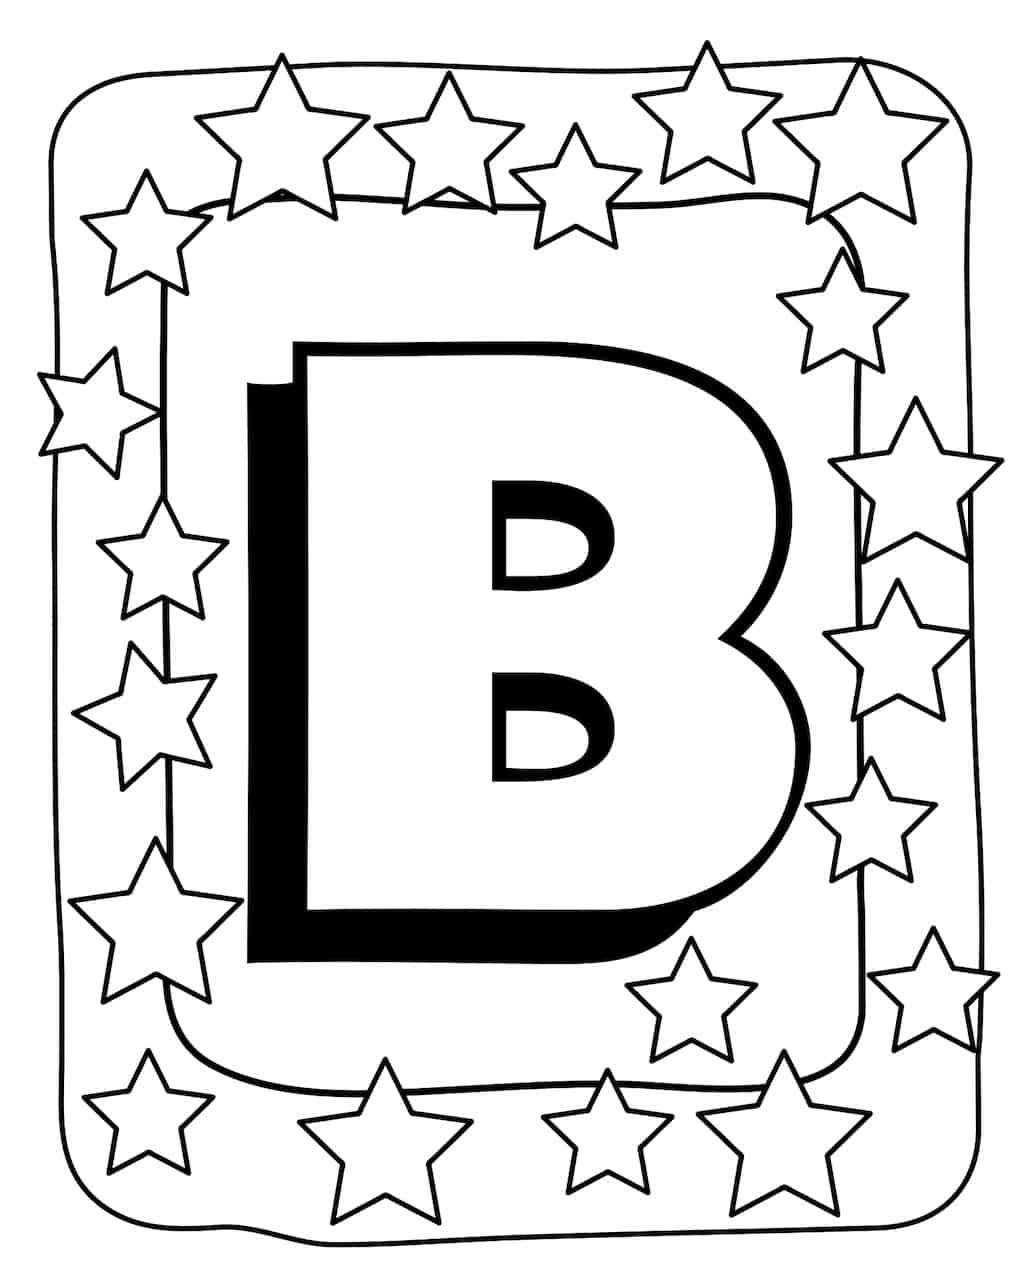 kleurplaat letter b 2 topkleurplaat nl